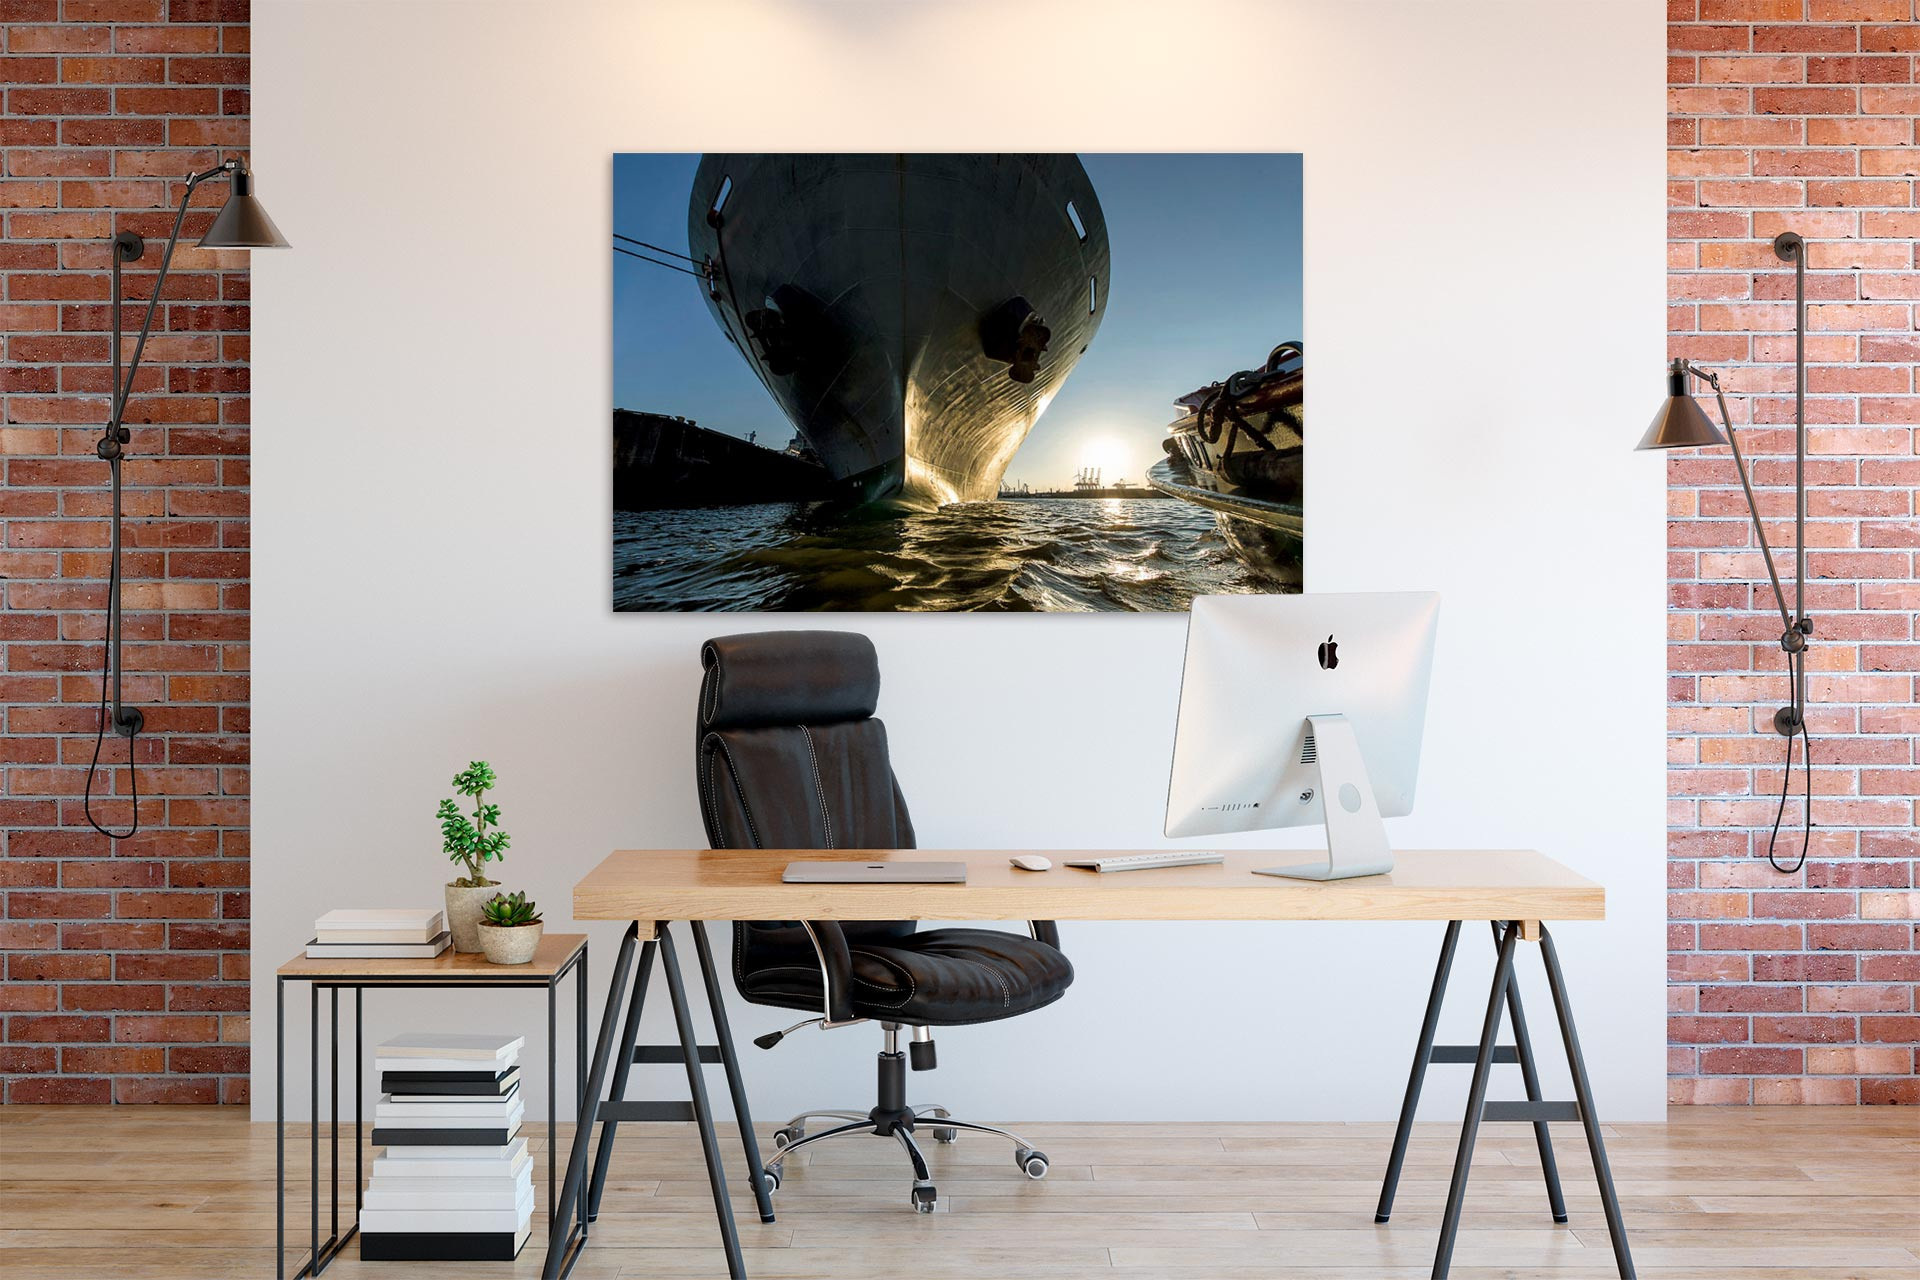 NL061-stek-ut-hamburg-wandbild-auf-leinwand-acrylglas-aludibond-buero